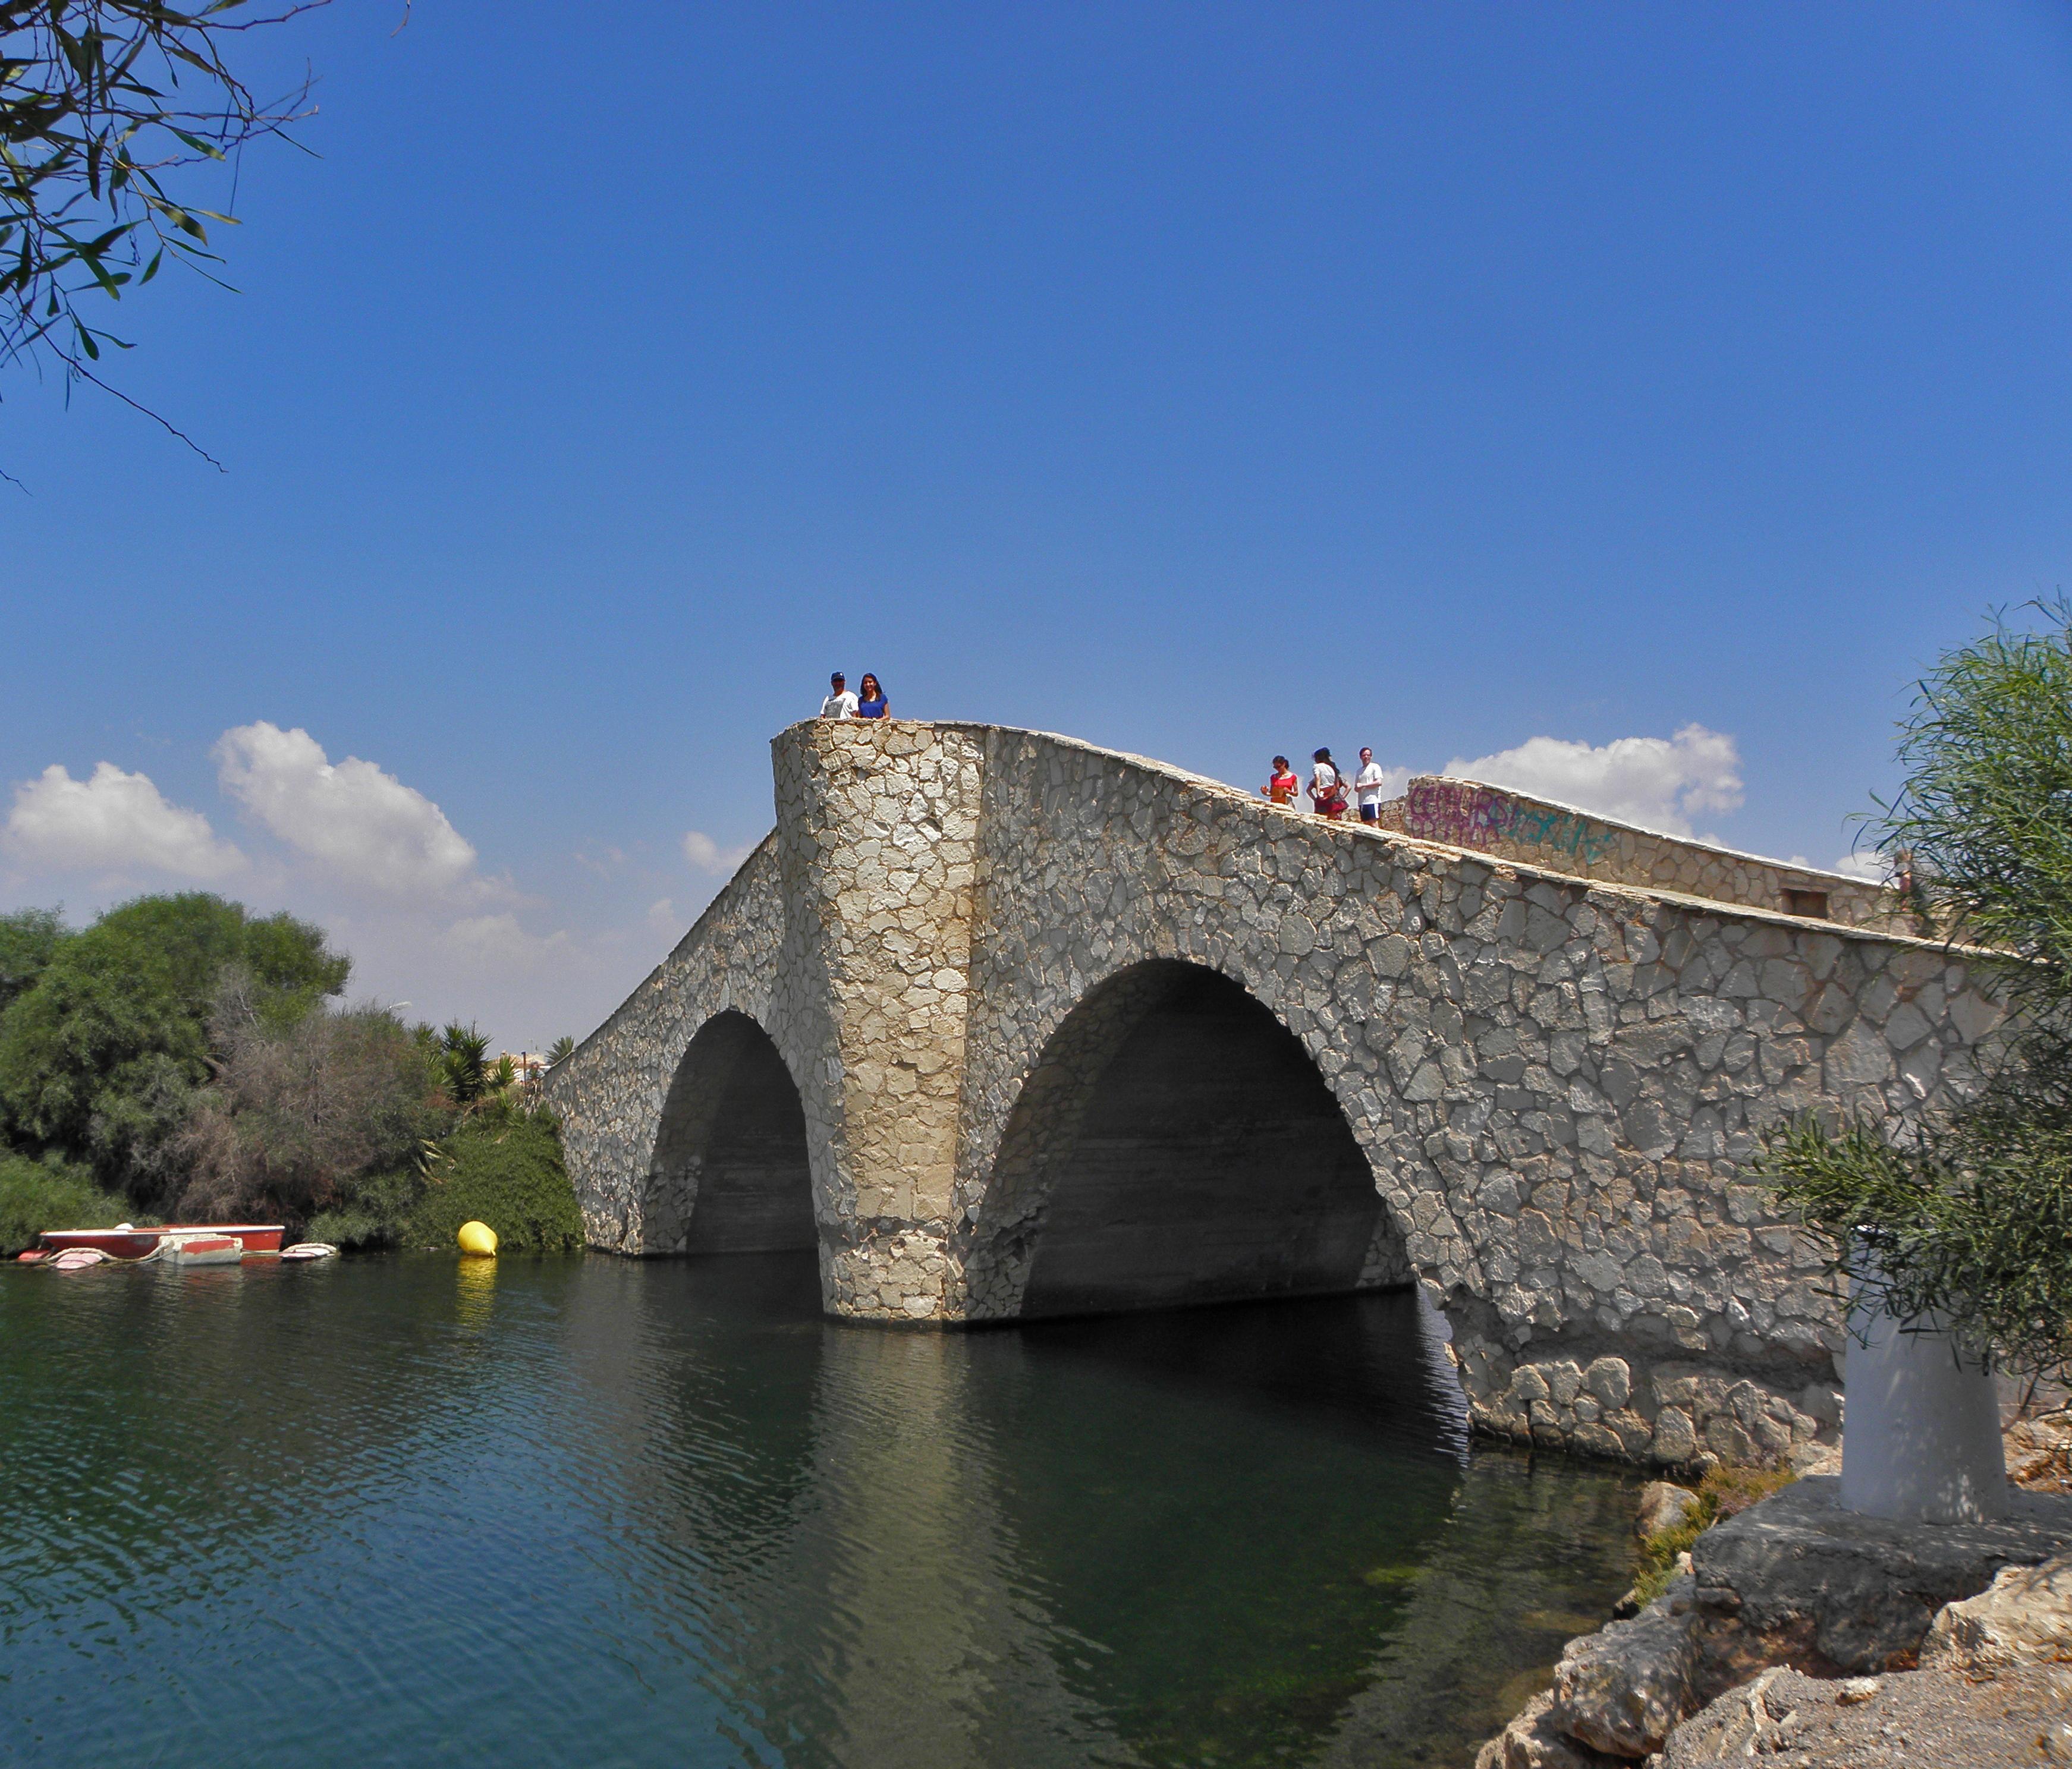 File:Puente De La Risa (La Manga Del Mar Menor).jpg